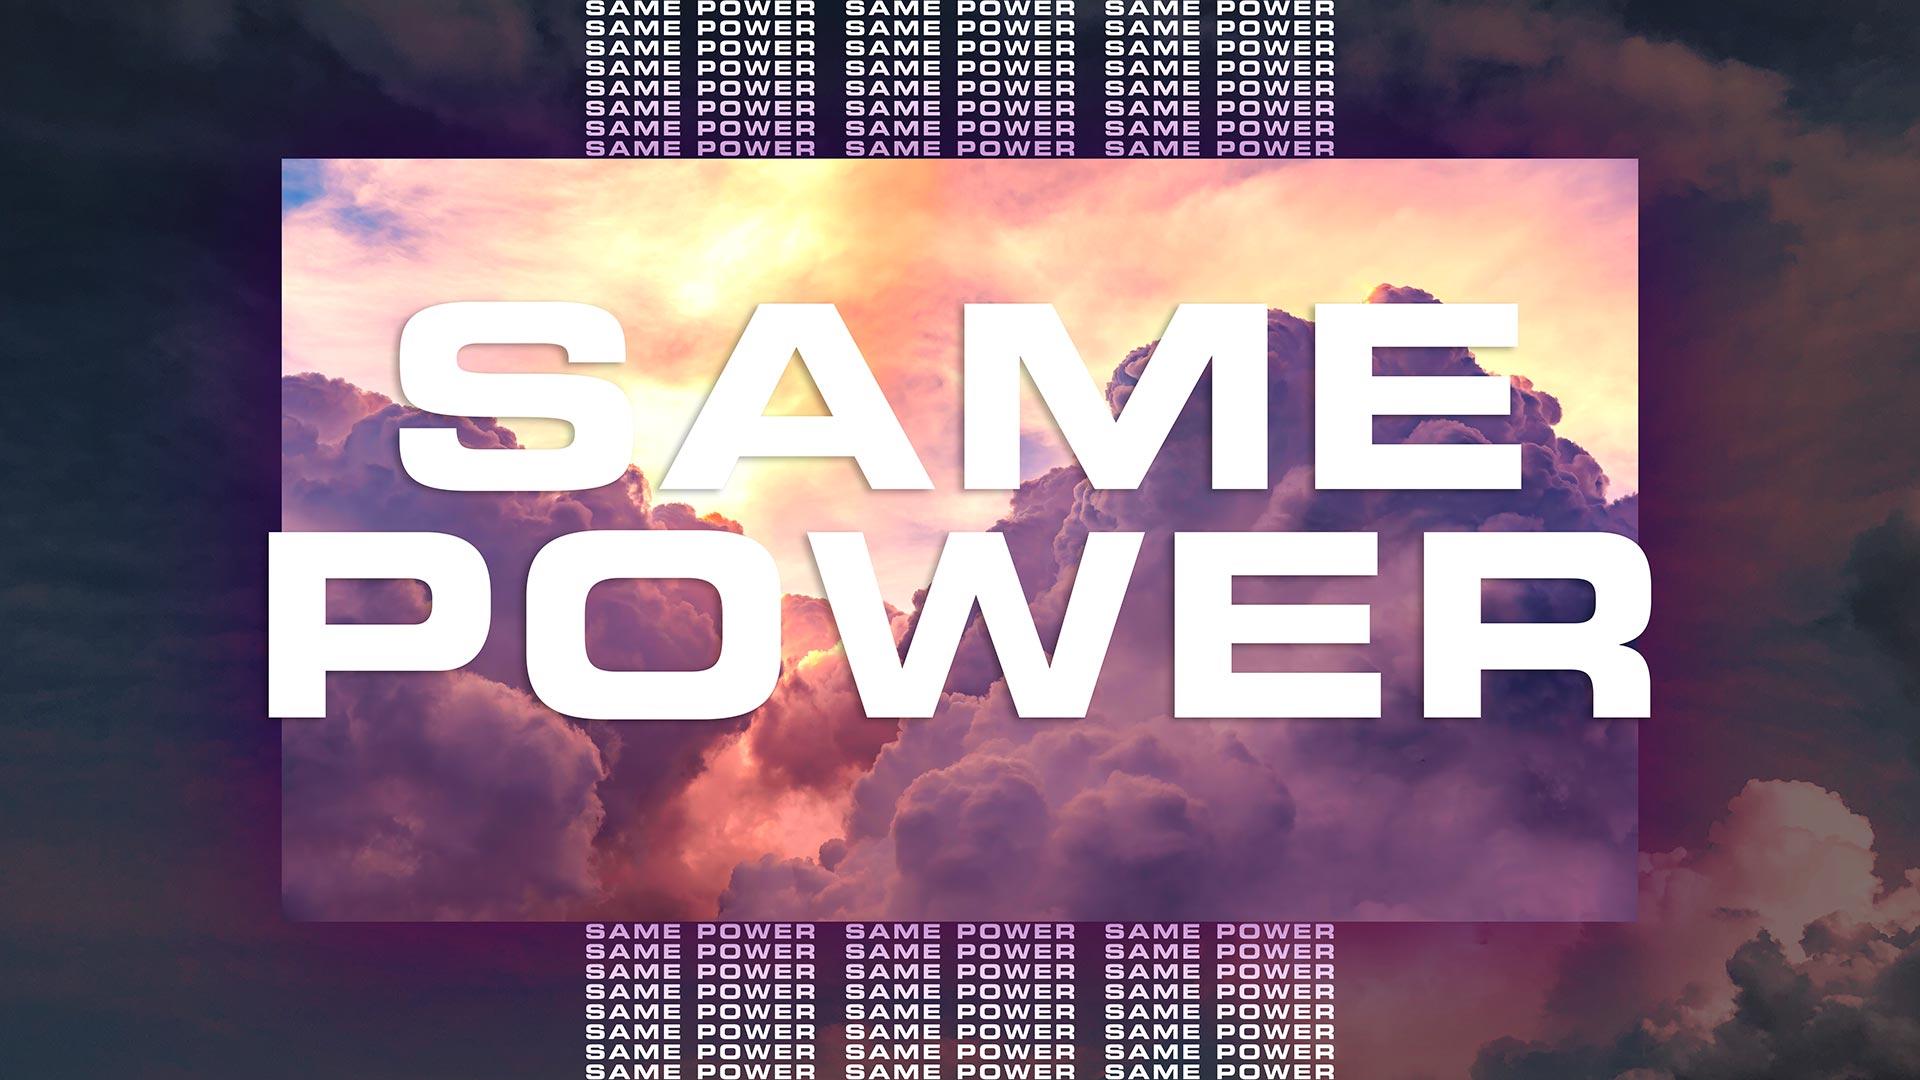 Same Power